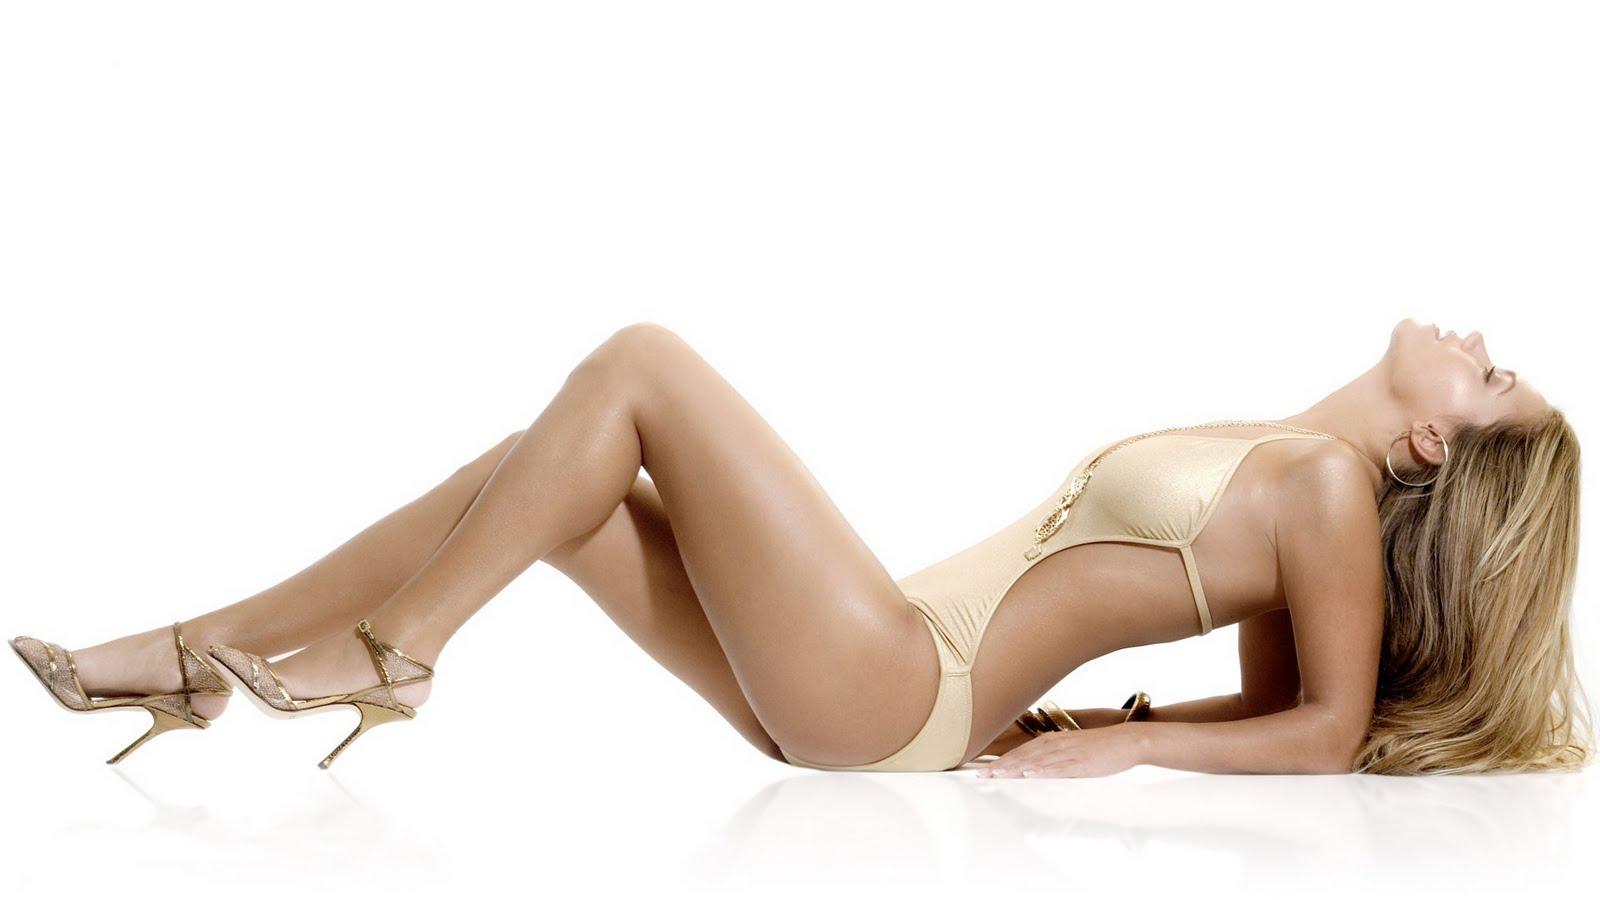 http://1.bp.blogspot.com/-38aJZtuODmw/TdAS67dXV4I/AAAAAAAAKGI/iLQYmuXsjxE/s1600/sexy-bikini-model-desktop-widescreen-wallpaper+%25282%2529.JPG